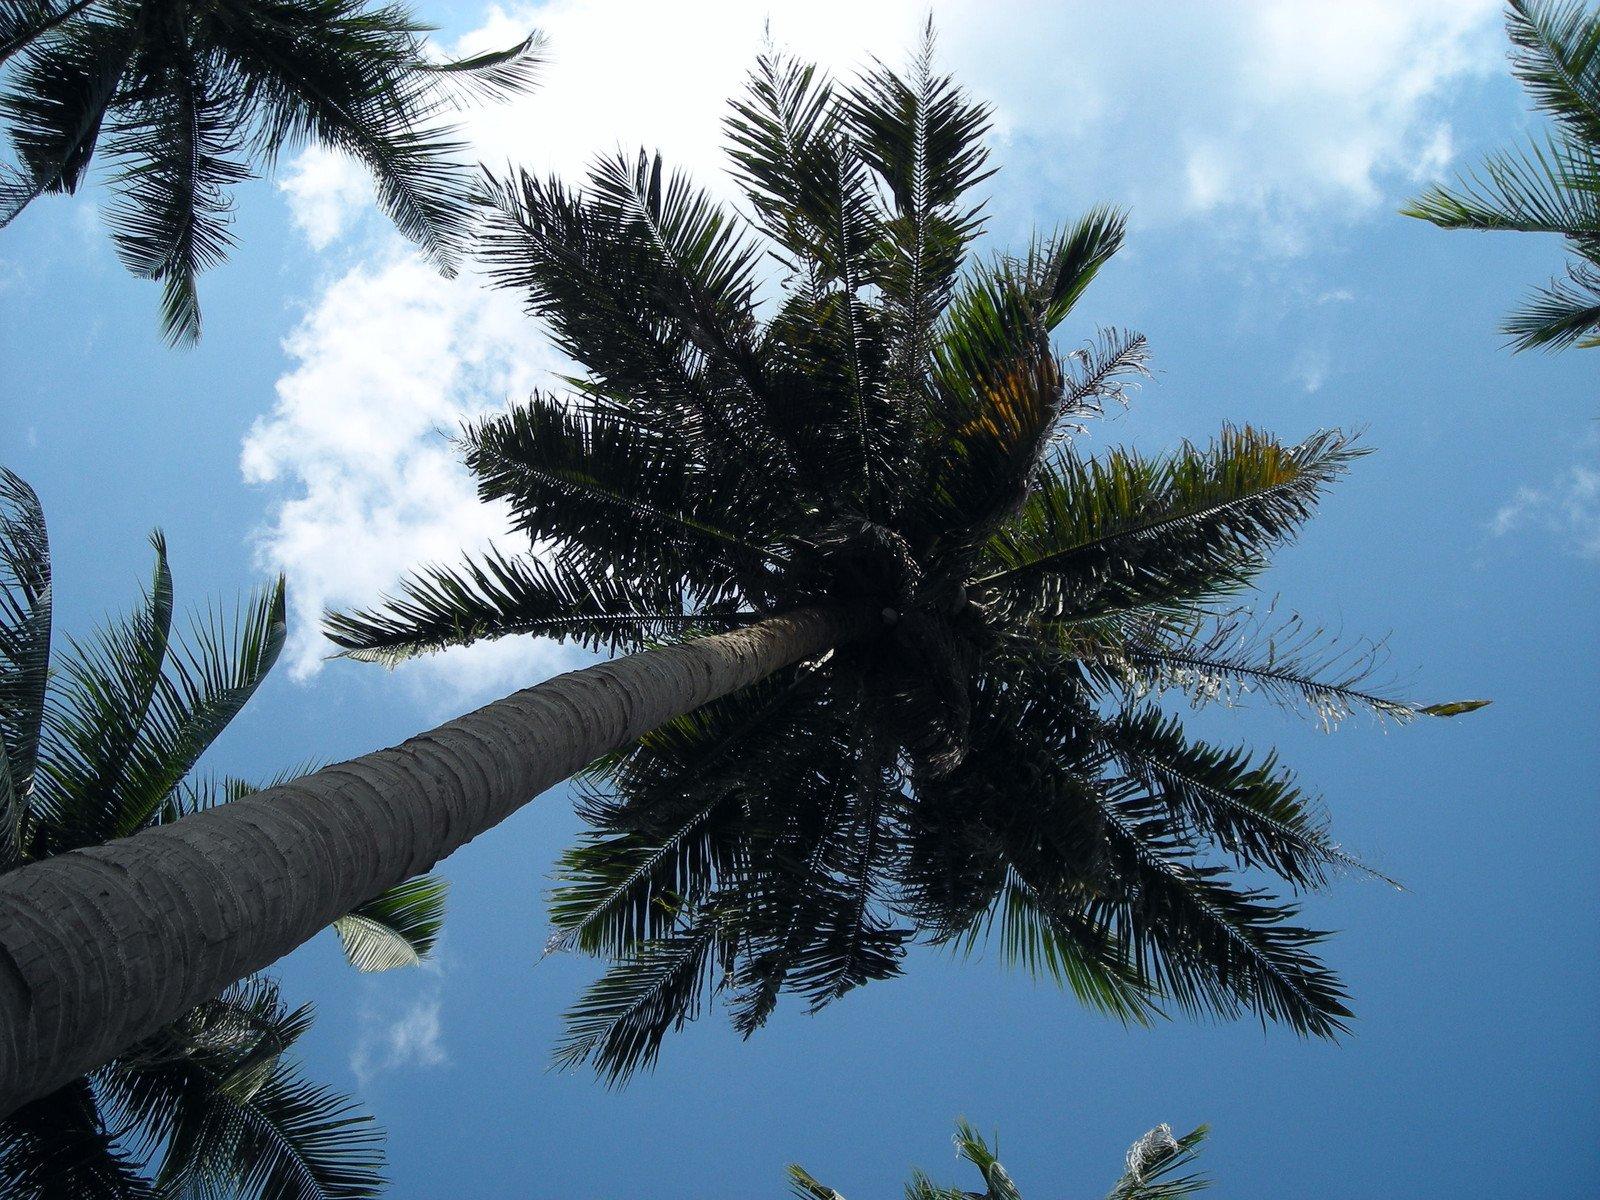 Arbres de noix de coco photo 1380339 - Arbre noix de coco ...